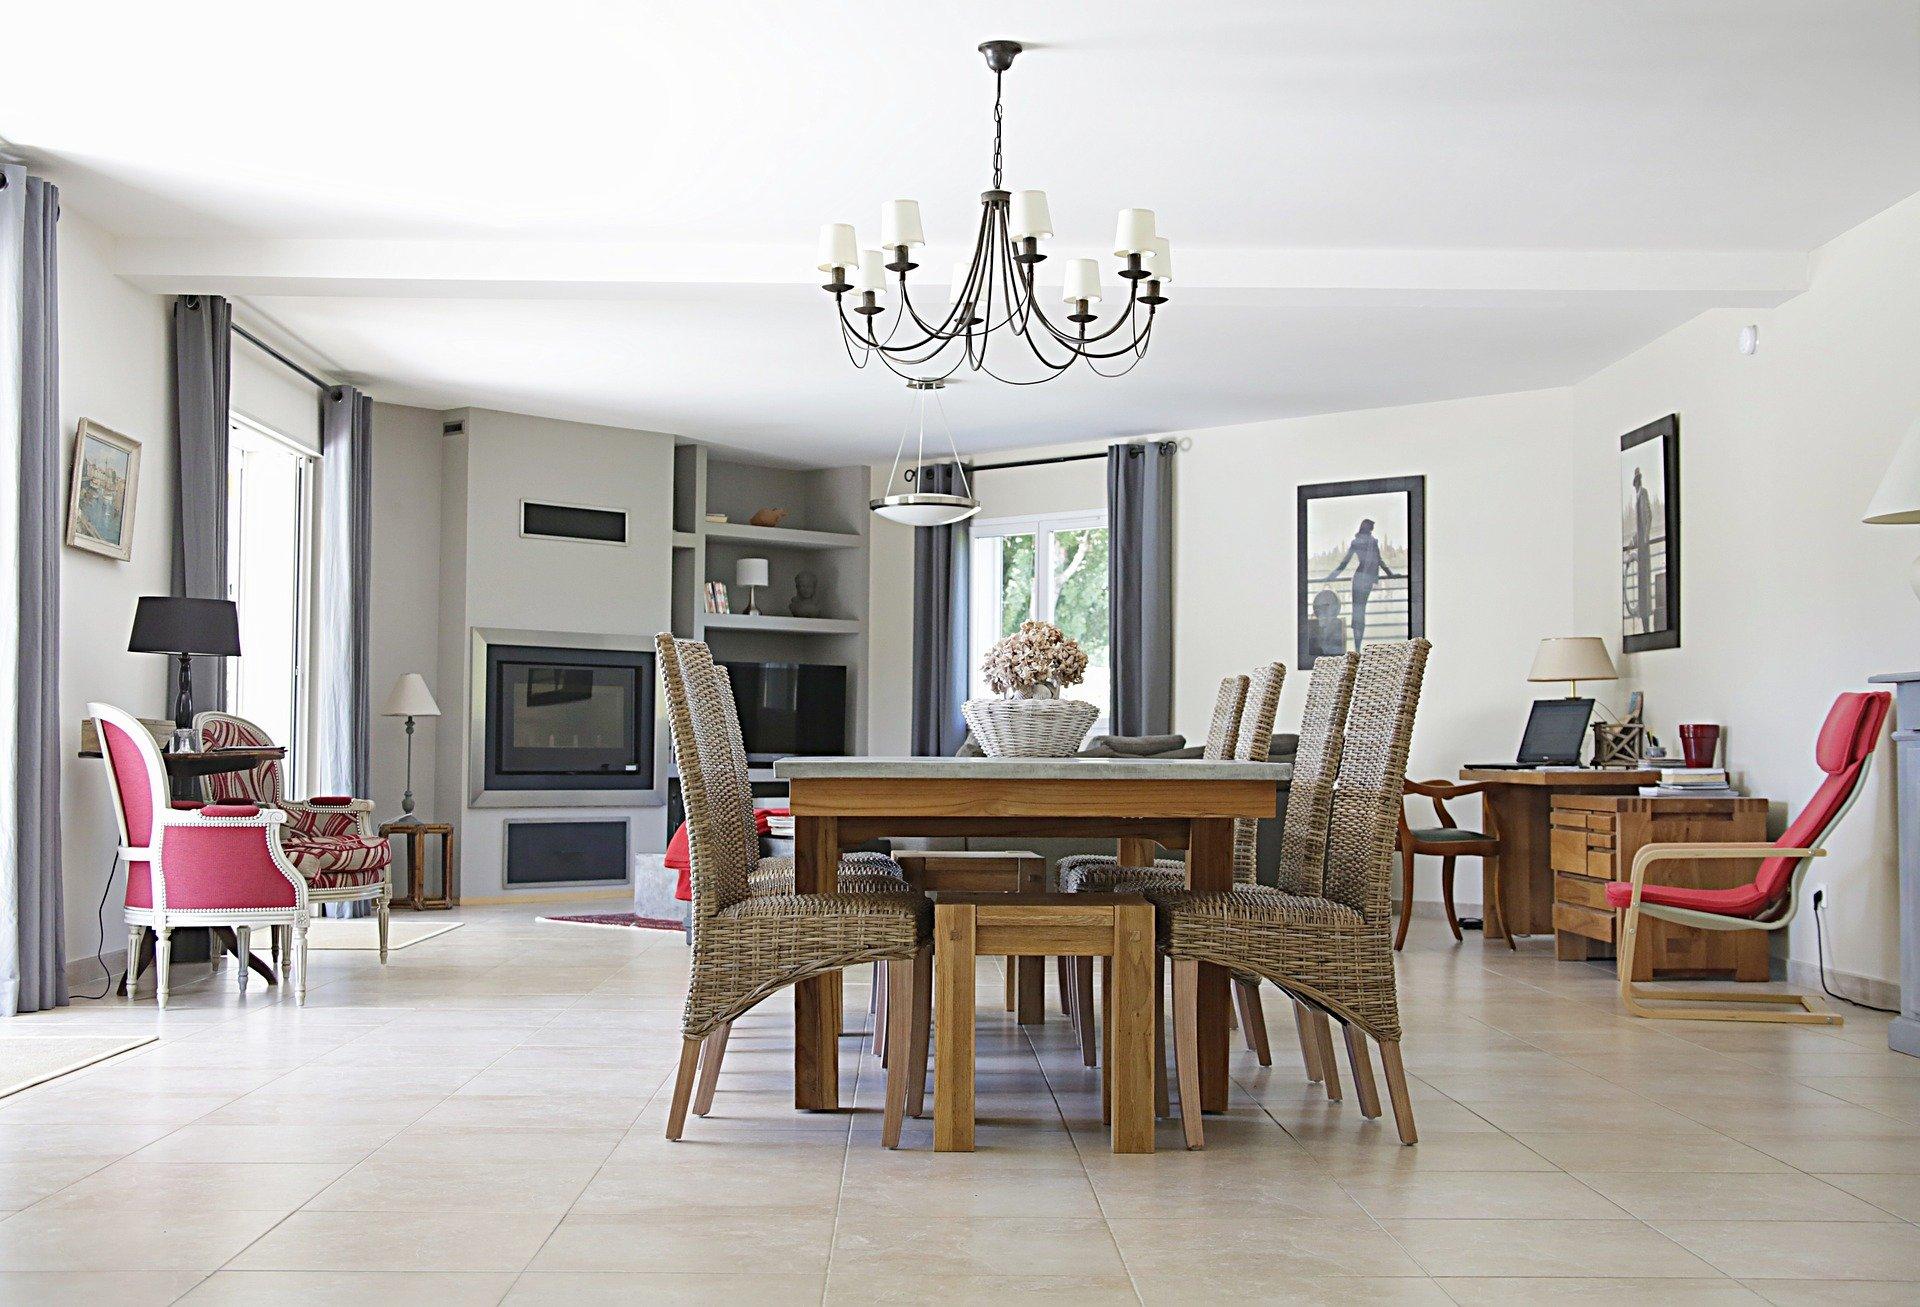 living room 1517166 1920